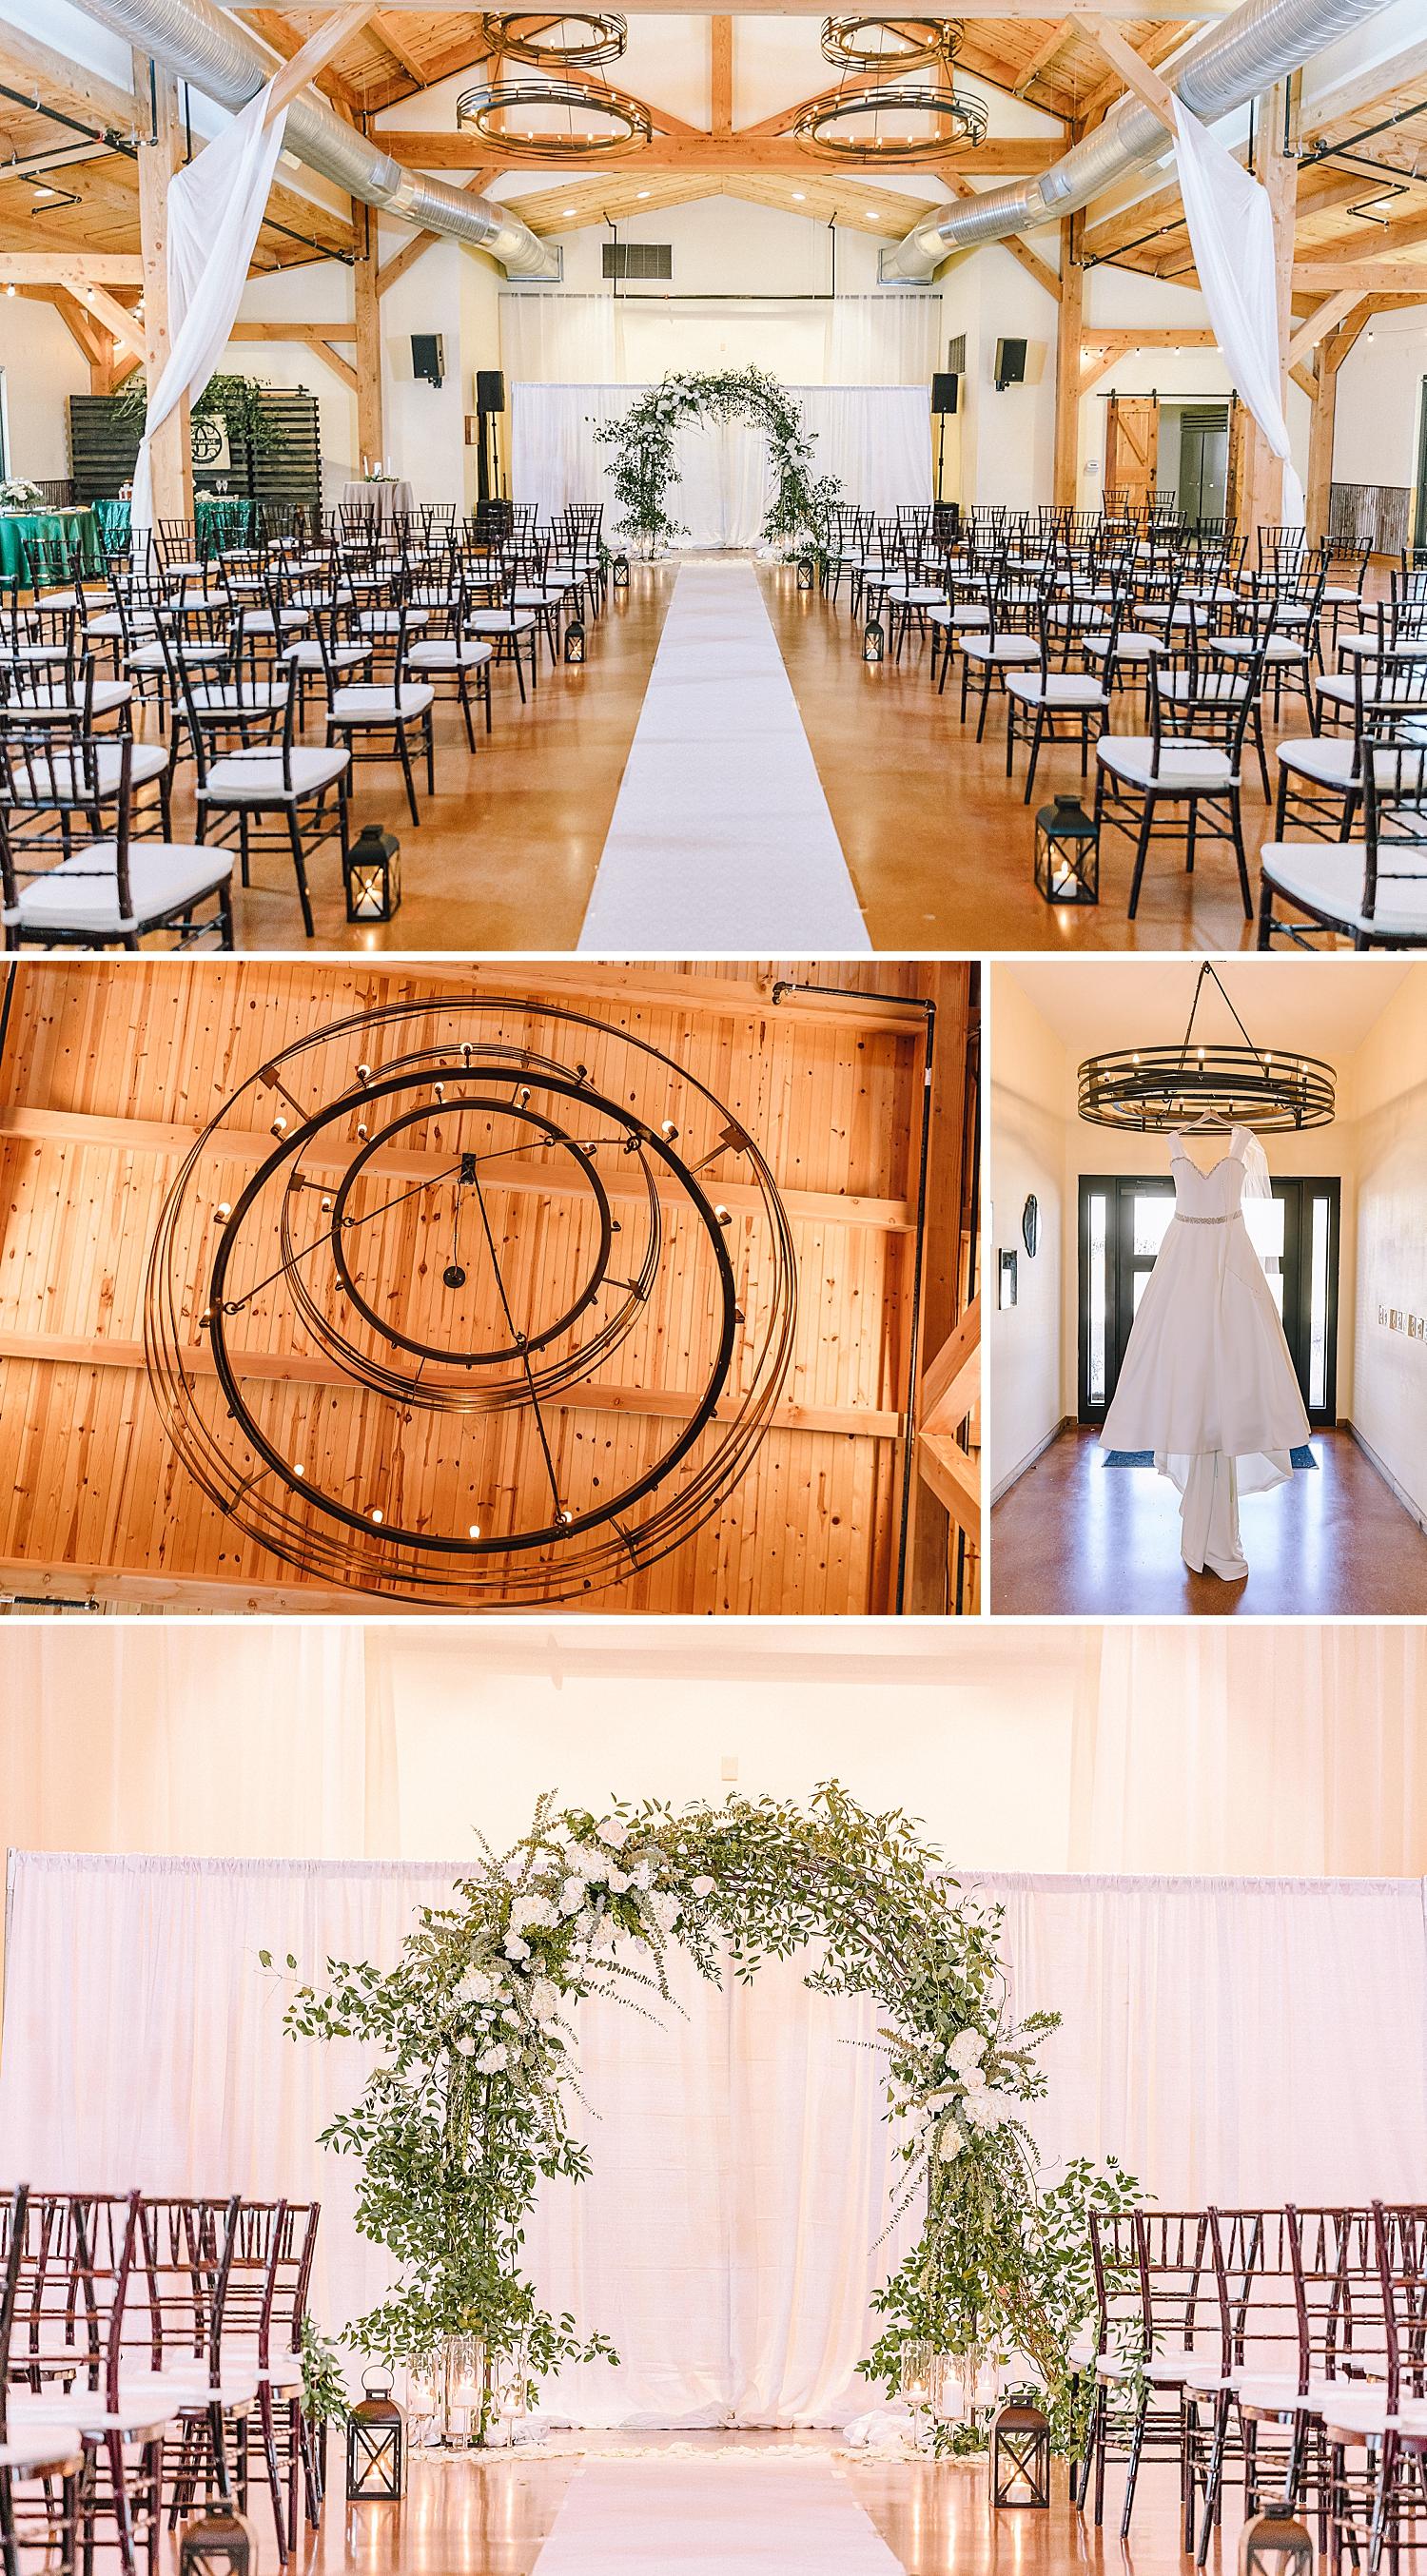 Magnolia-Halle-Wedding-San-Antonio-Texas-Bride-Grom_0003.jpg